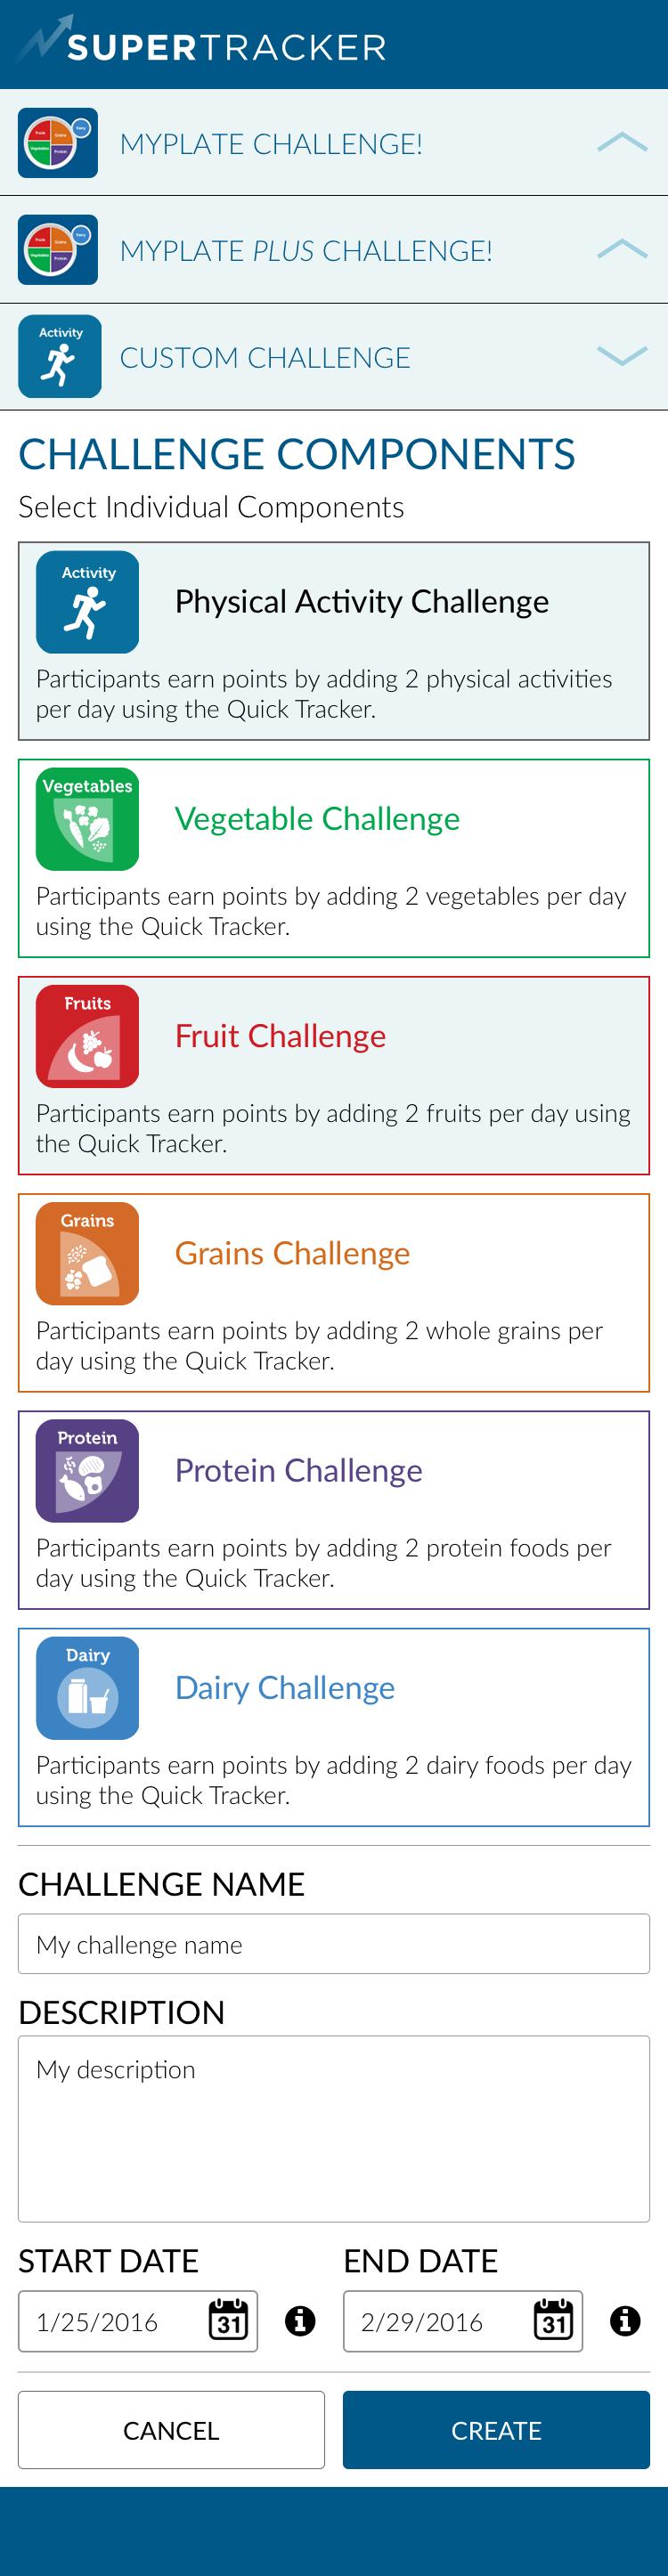 Custom Challenge - Components > Active